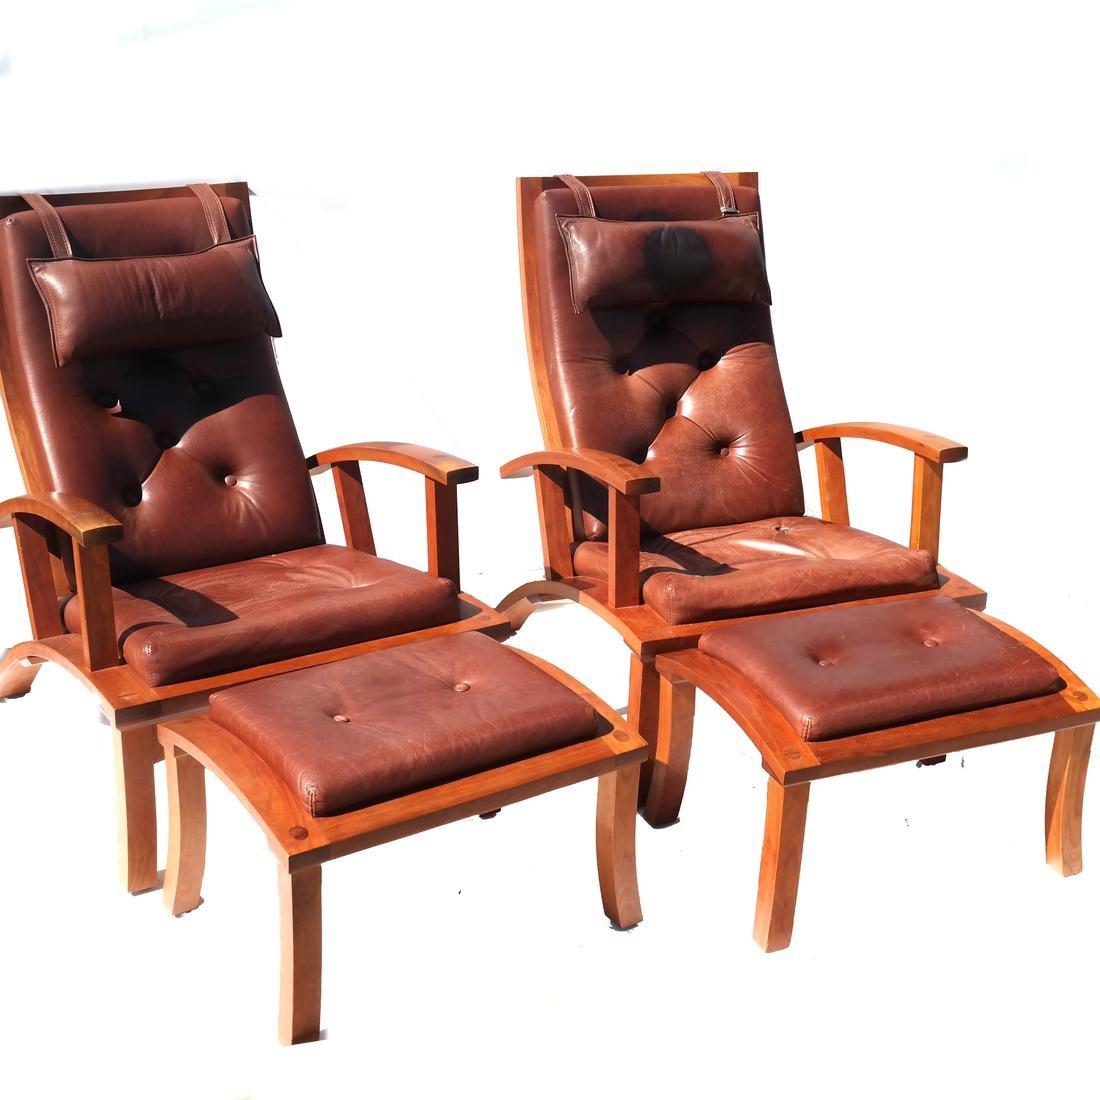 Thomas Moser - Contemporary Craft Armchairs & Ottomans